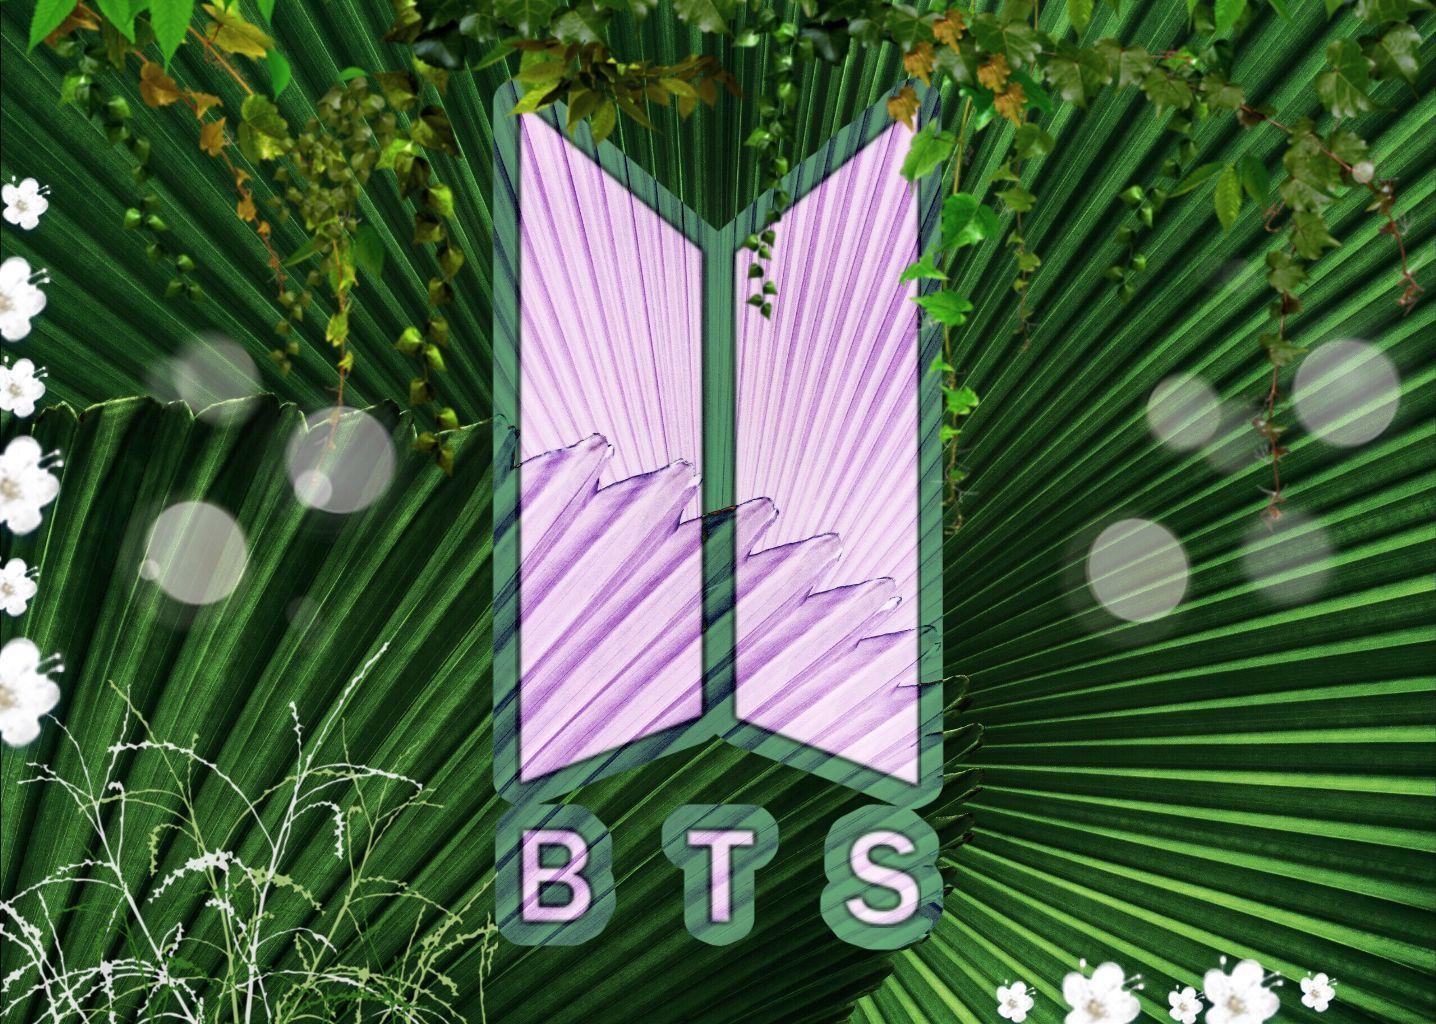 1024x1024 Bts New Logo Army S Amino Bts Wallpaper Lyrics Bts Army Logo Bts Army Bomb